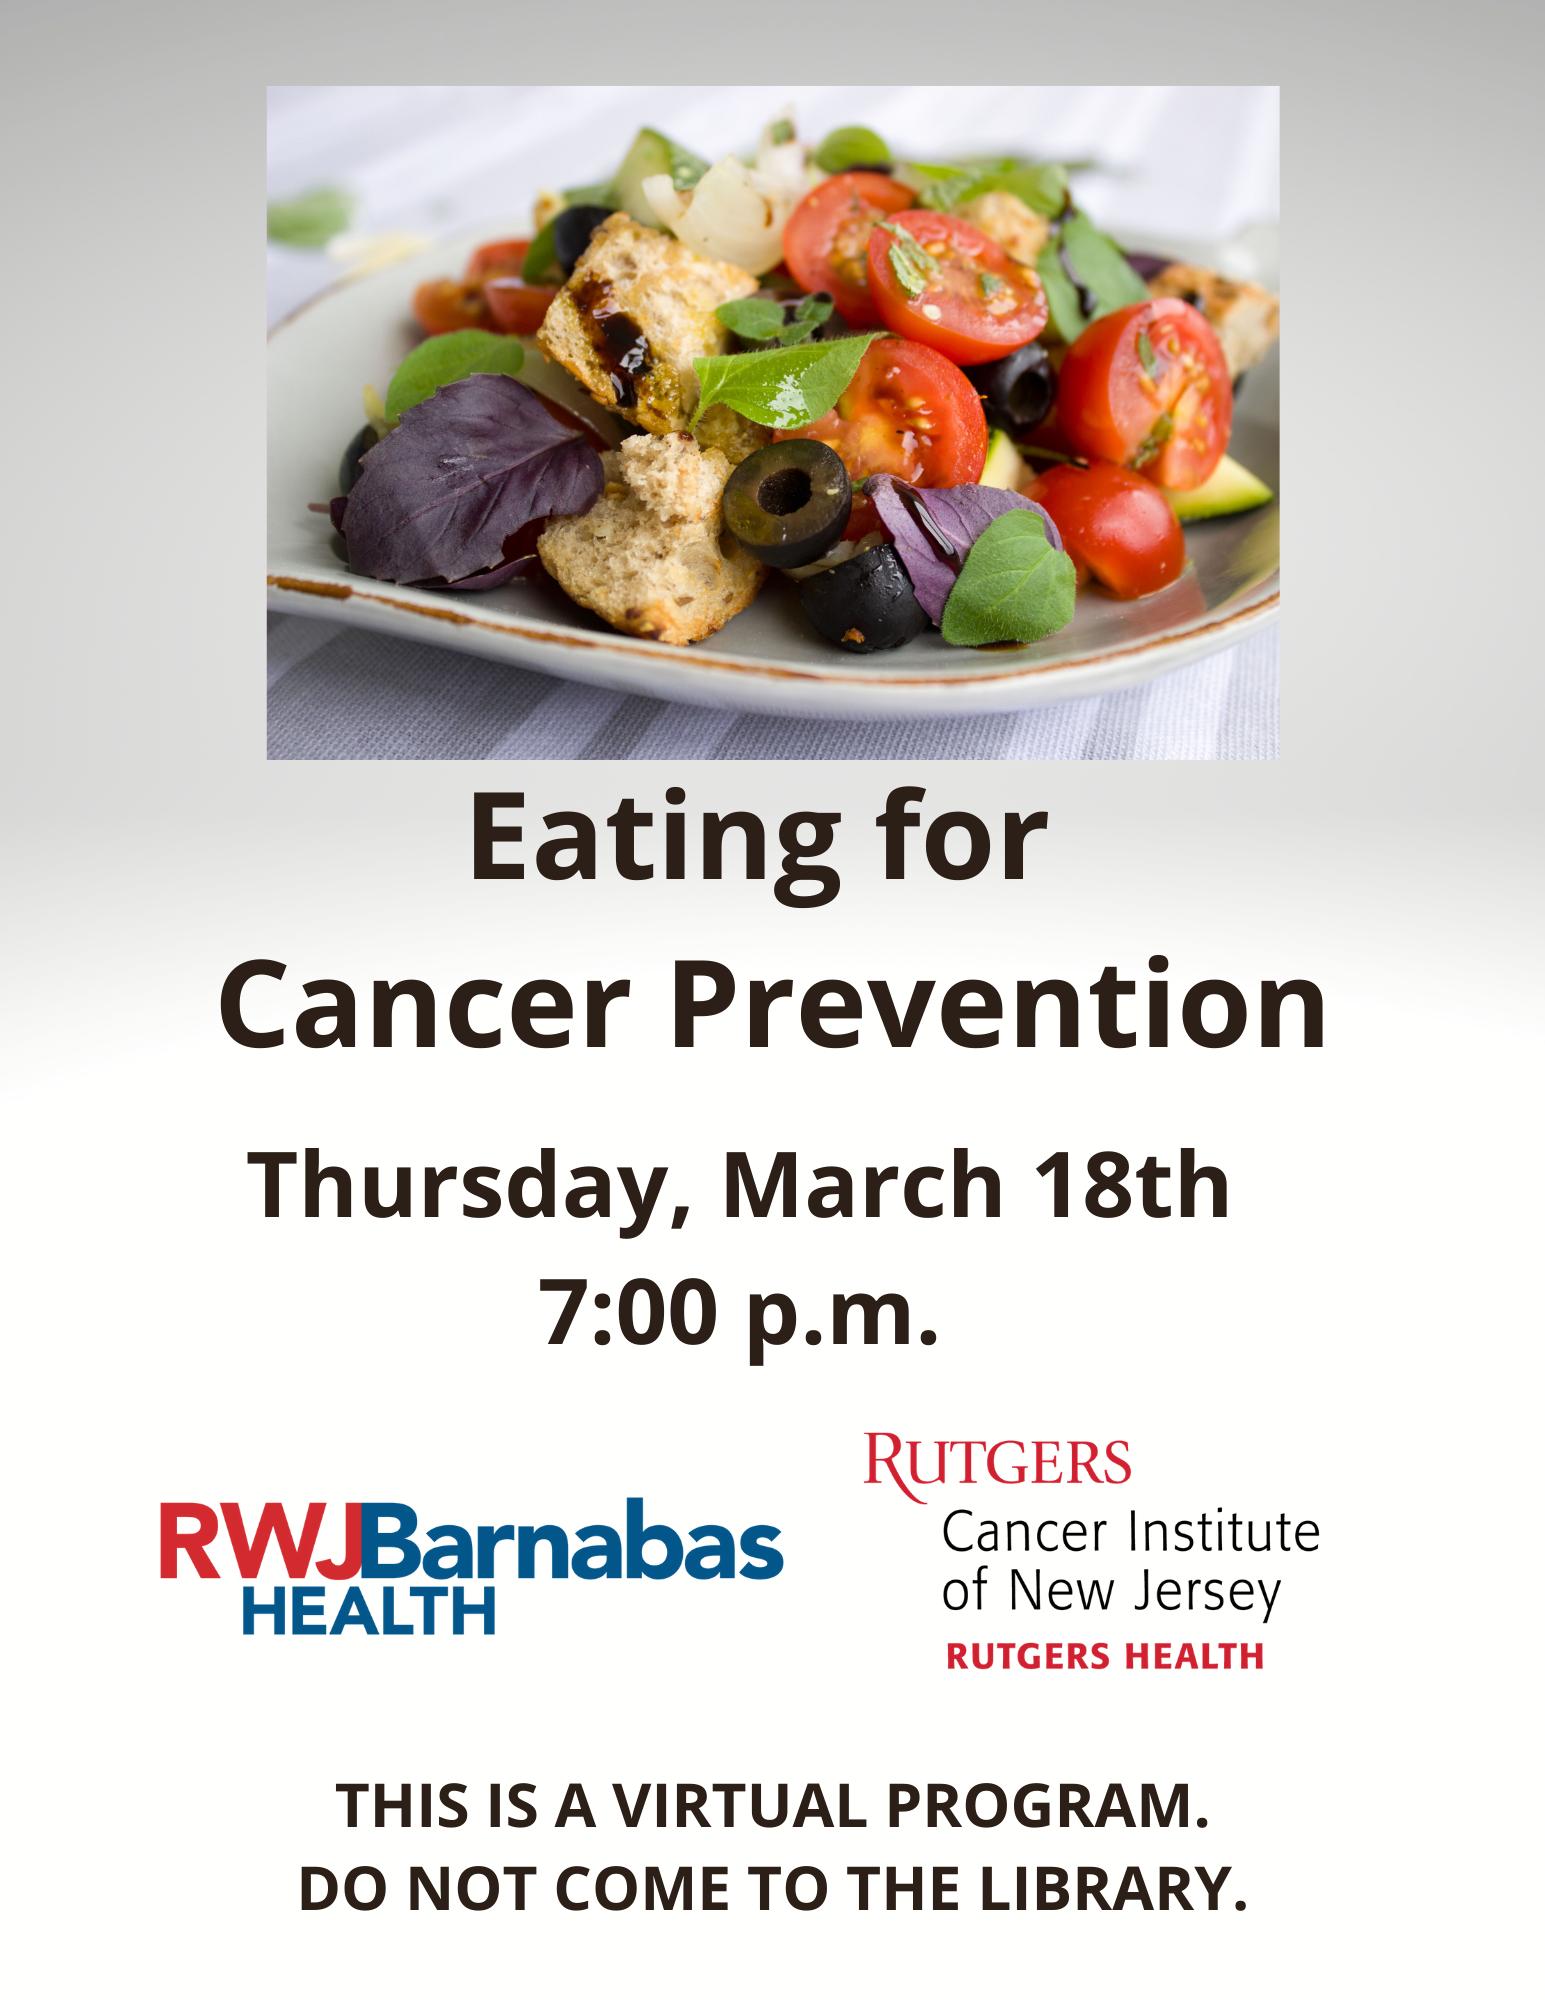 Eating for Cancer Prevention